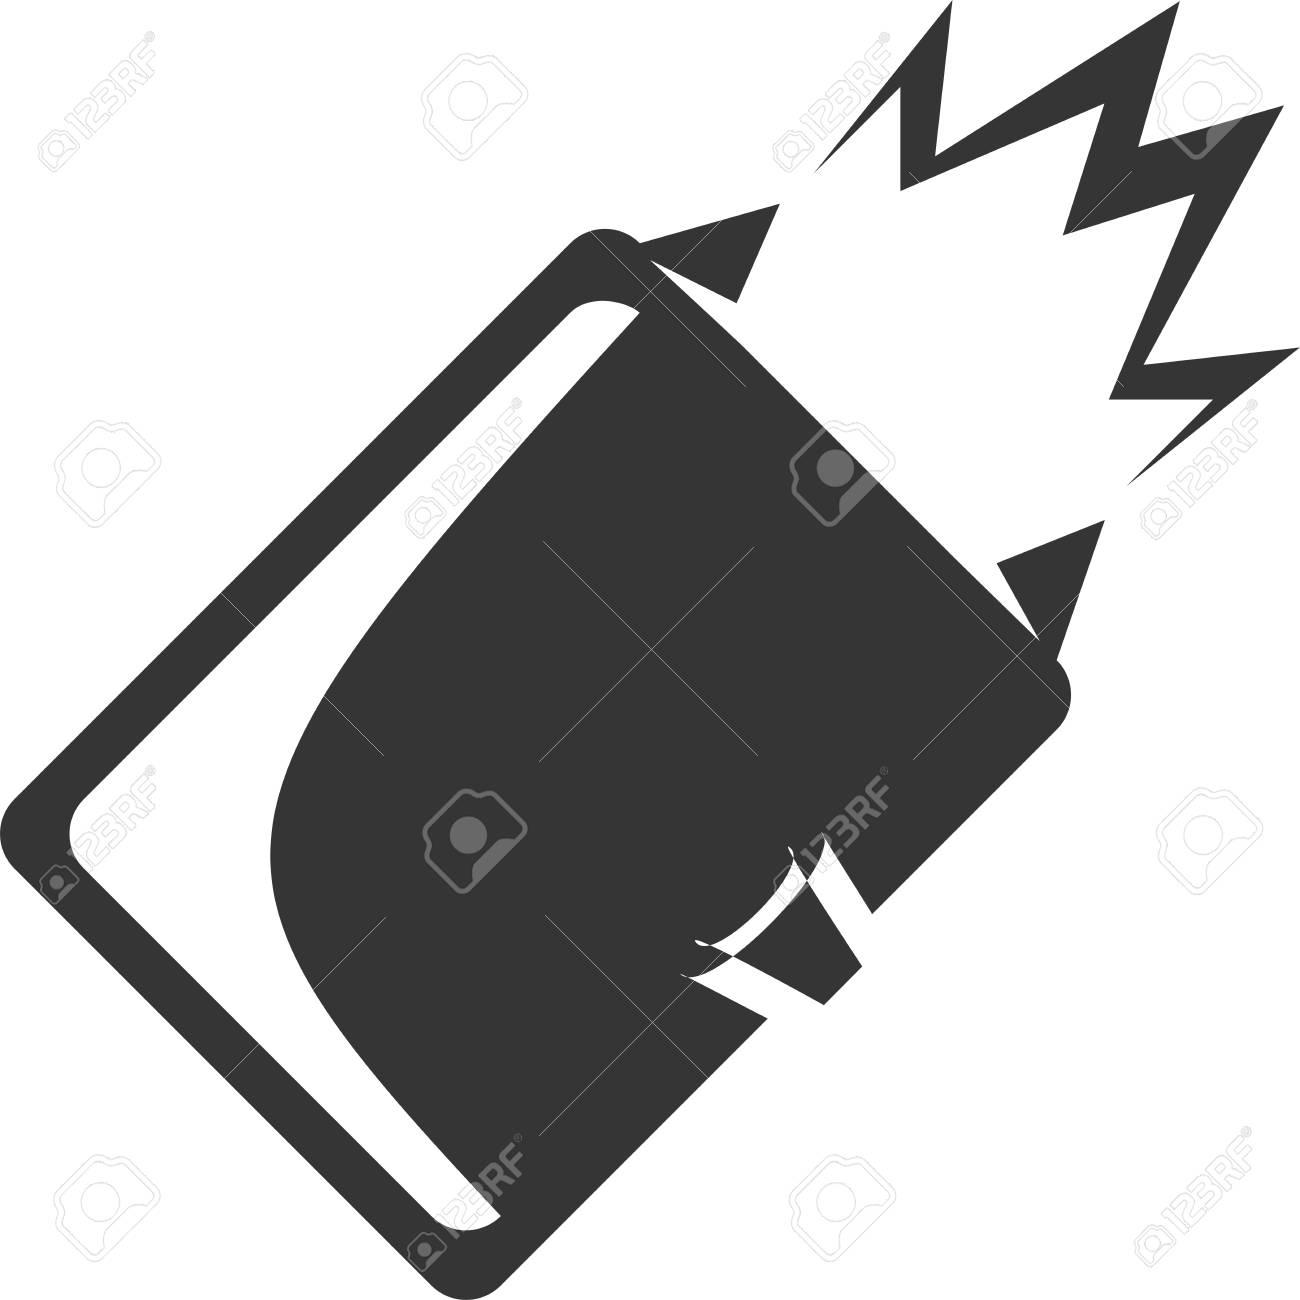 Taser Stun Gun Self Defense Personal Safety Defensive Electric